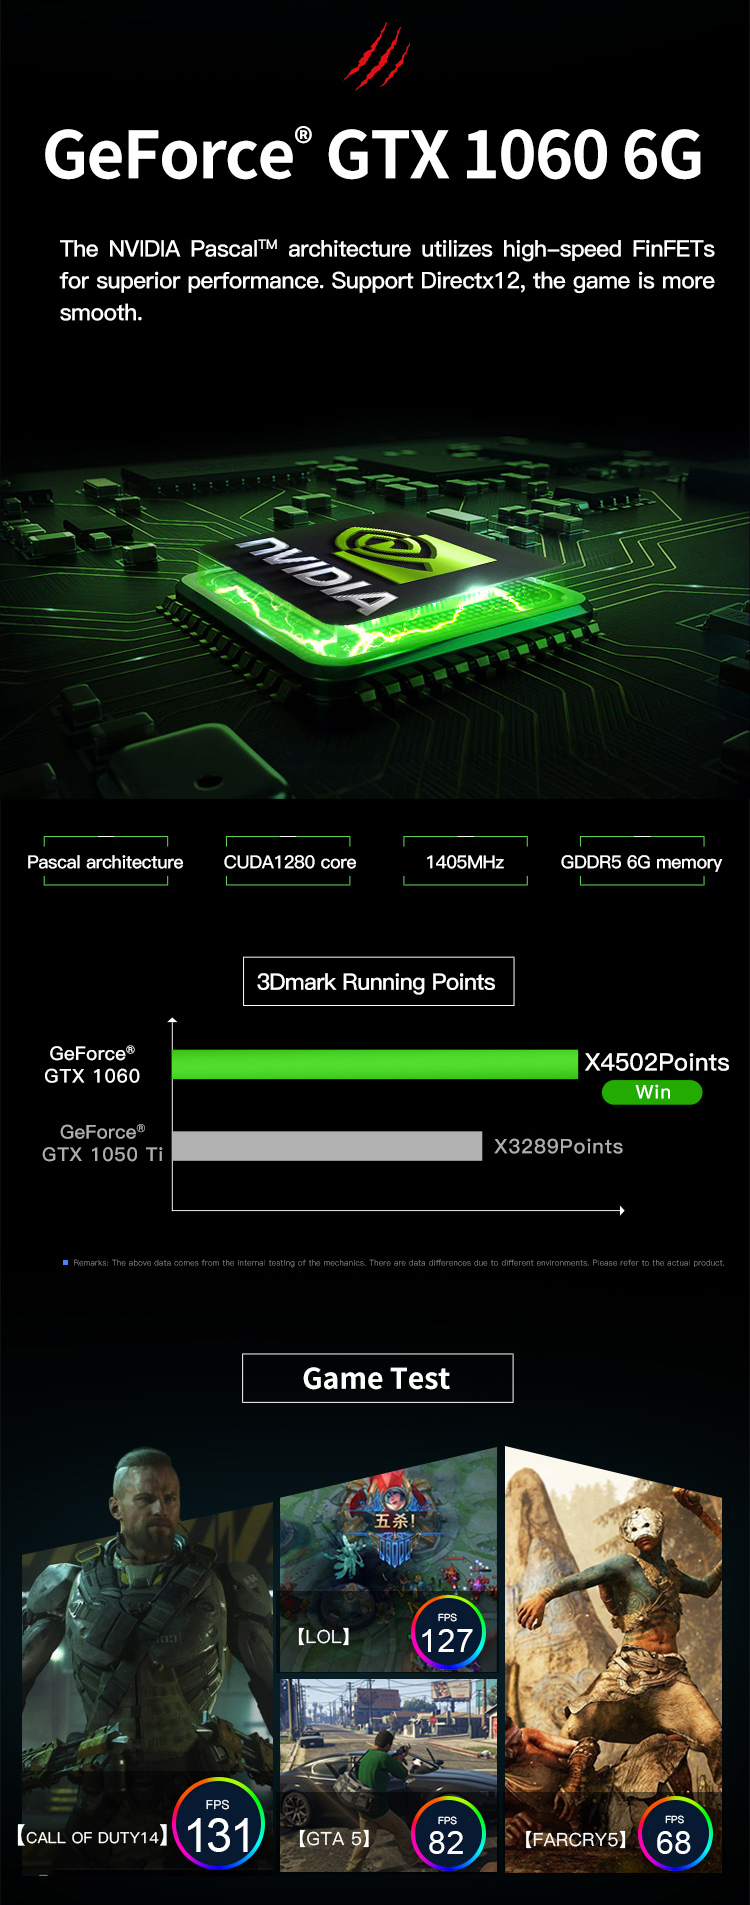 Hf3c85a773244483896cd229b12ae38879 Machenike T90-T6C Gaming Laptop (Intel Core i7-8750H+GTX 1060 6G/8GB RAM/256G SSD/15.6'' 144Hz72%NTSC) Machenike-brande notebook